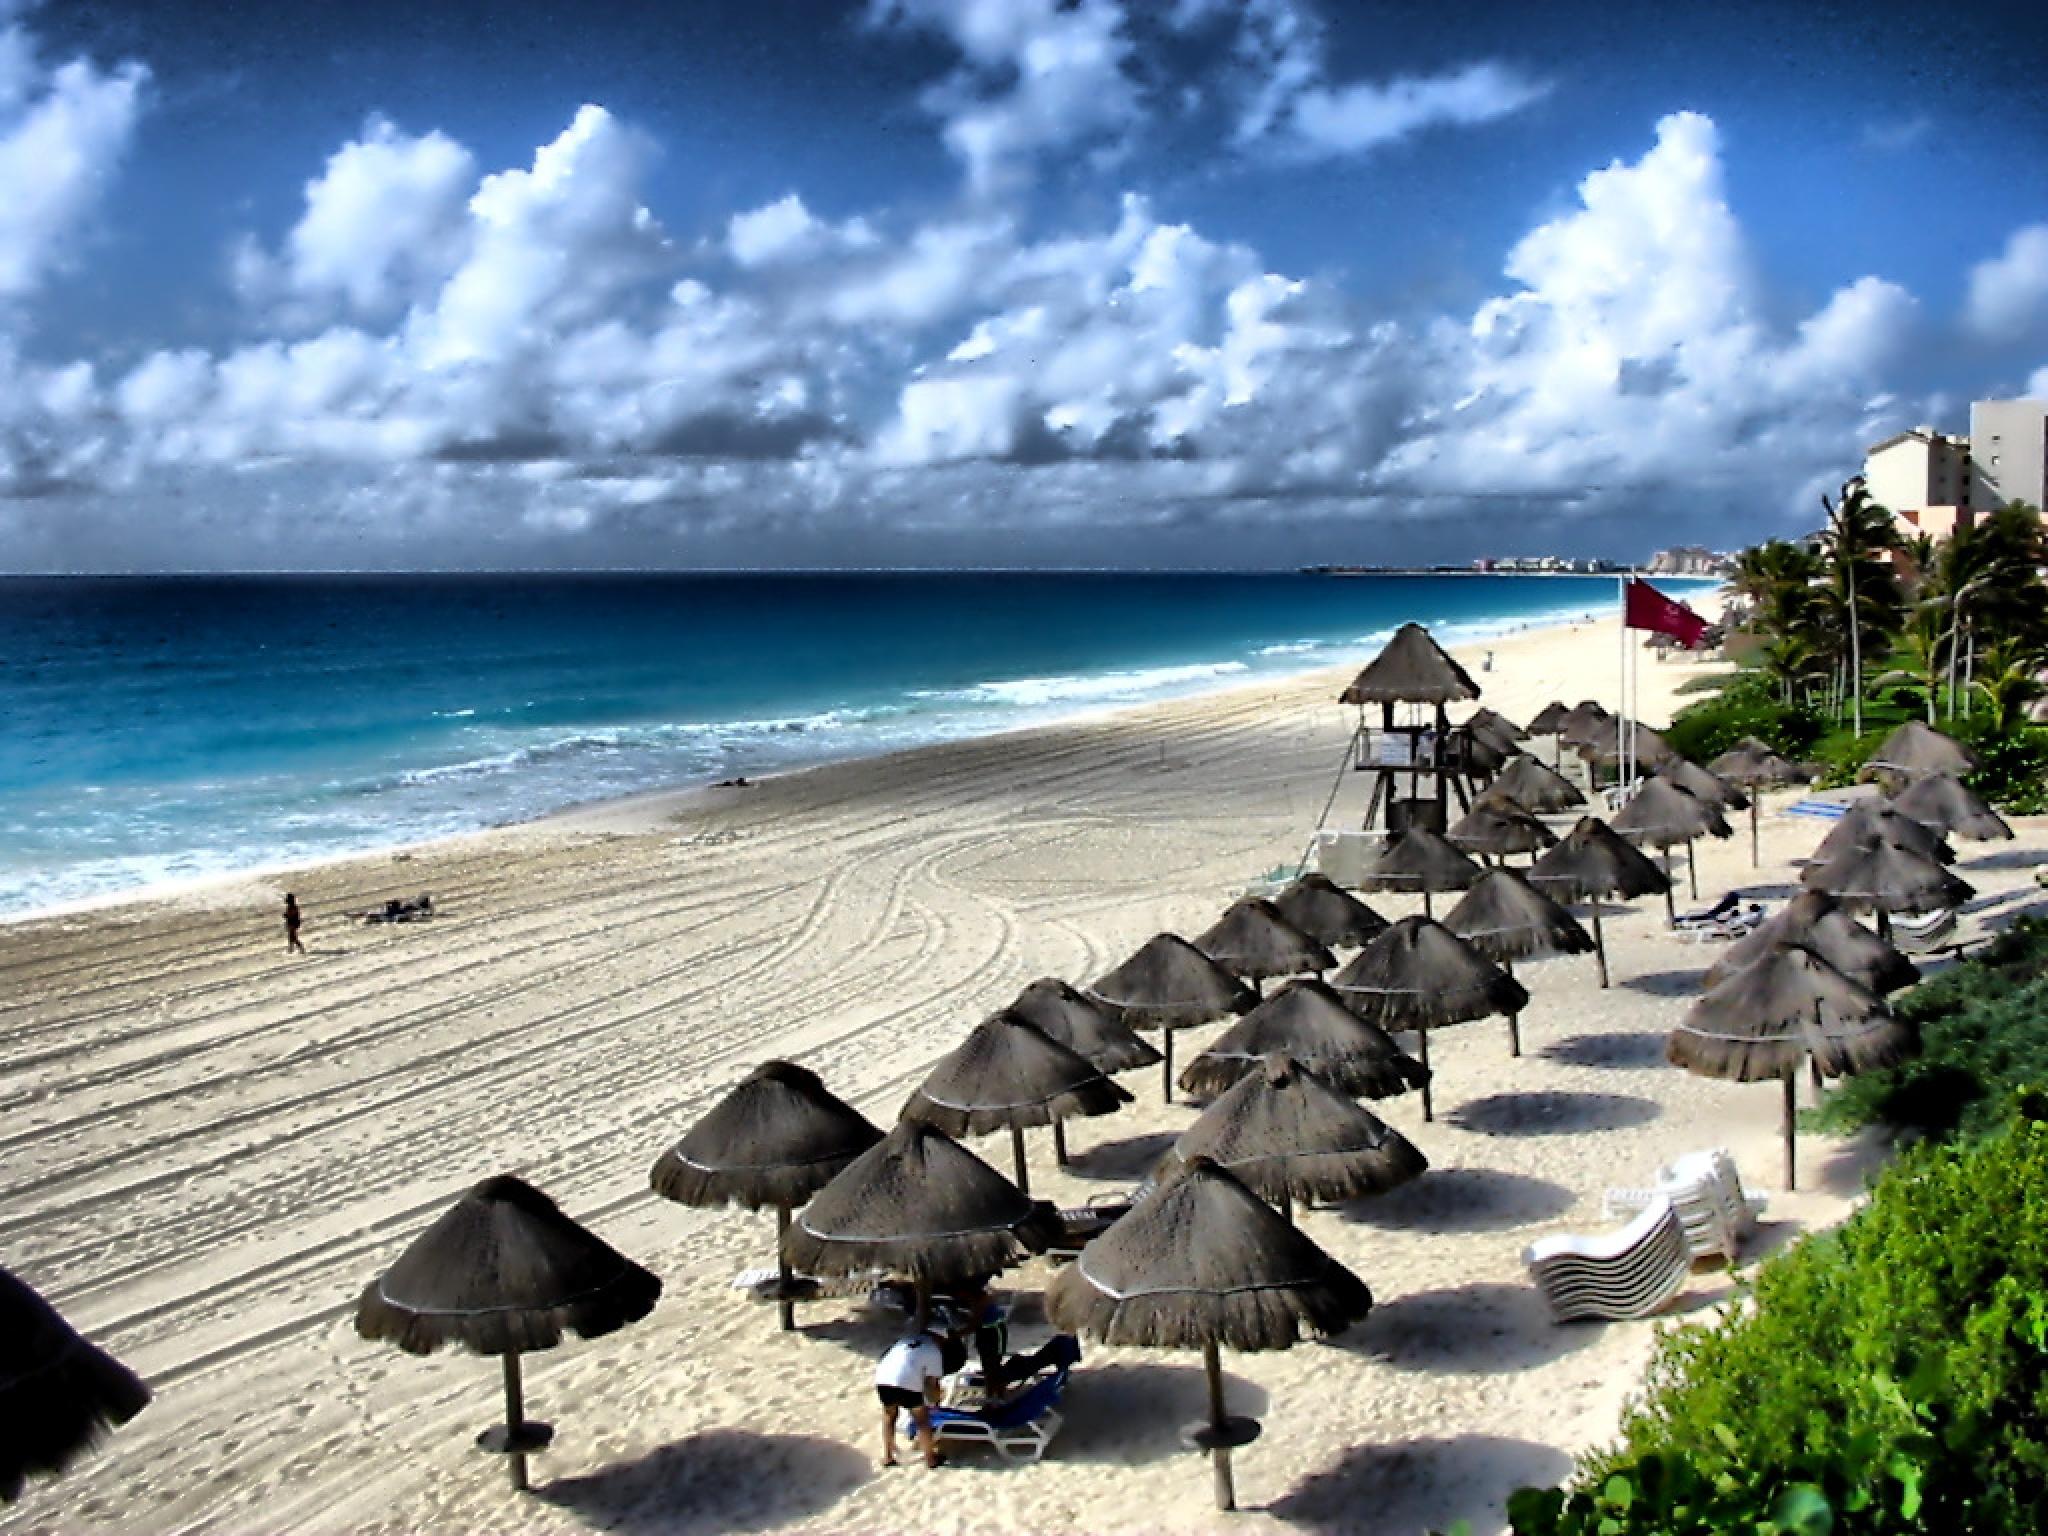 Cancun...10 years ago by Joaquim Gaspar